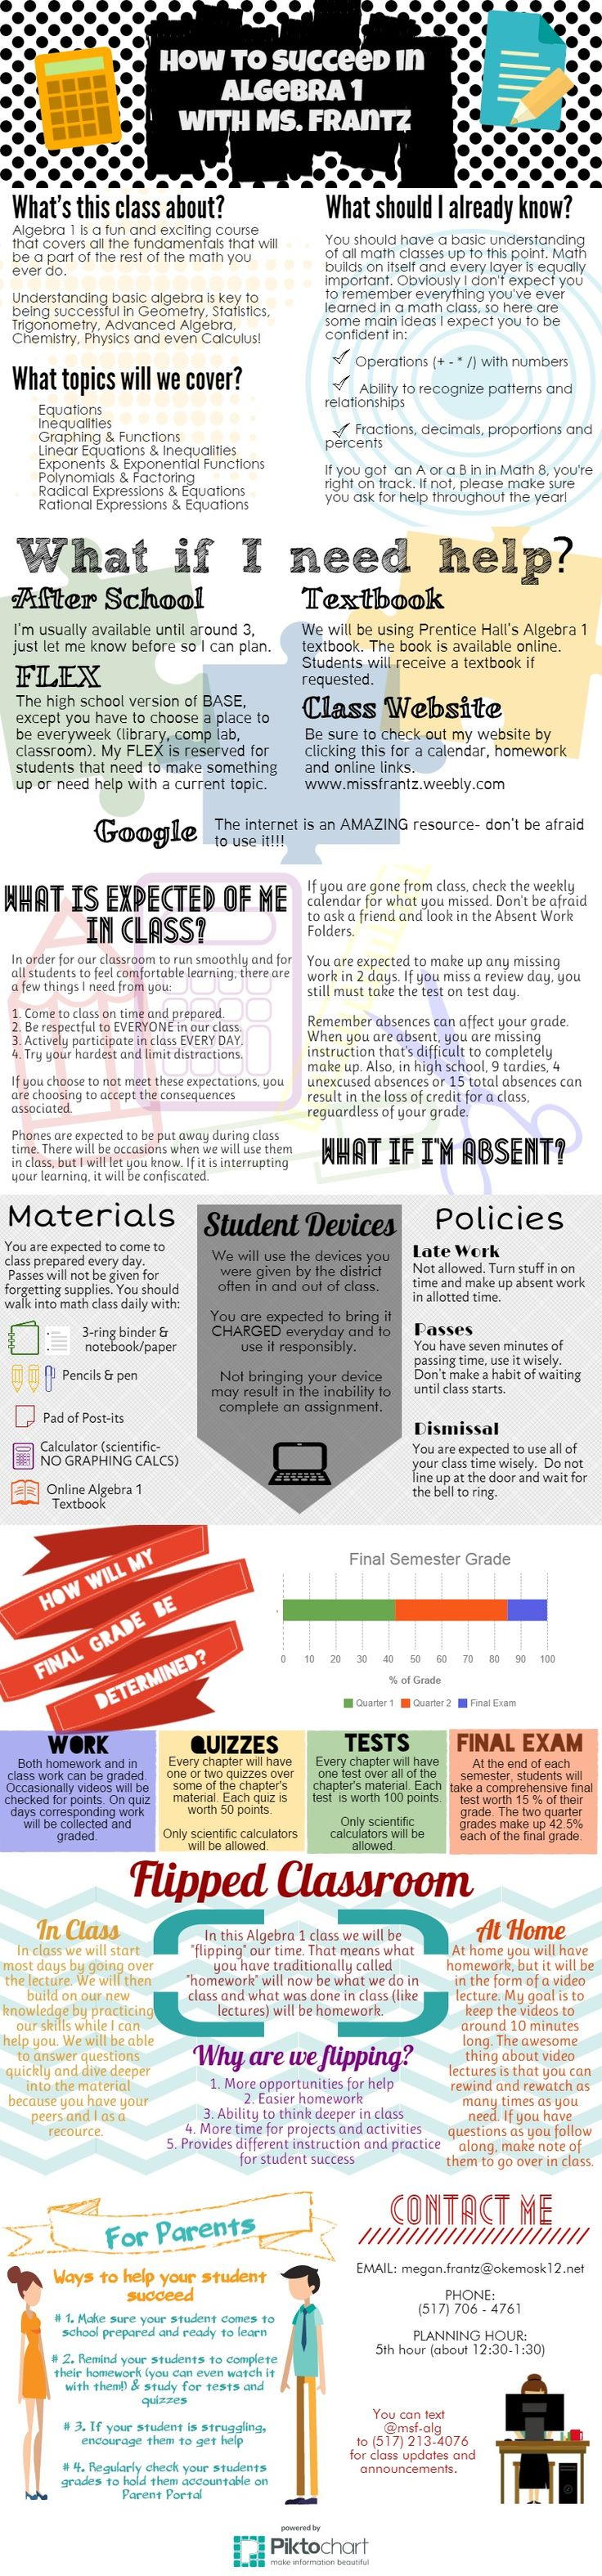 Ms. Frantz's Algebra 1 Syllabus | Piktochart Infographic Editor